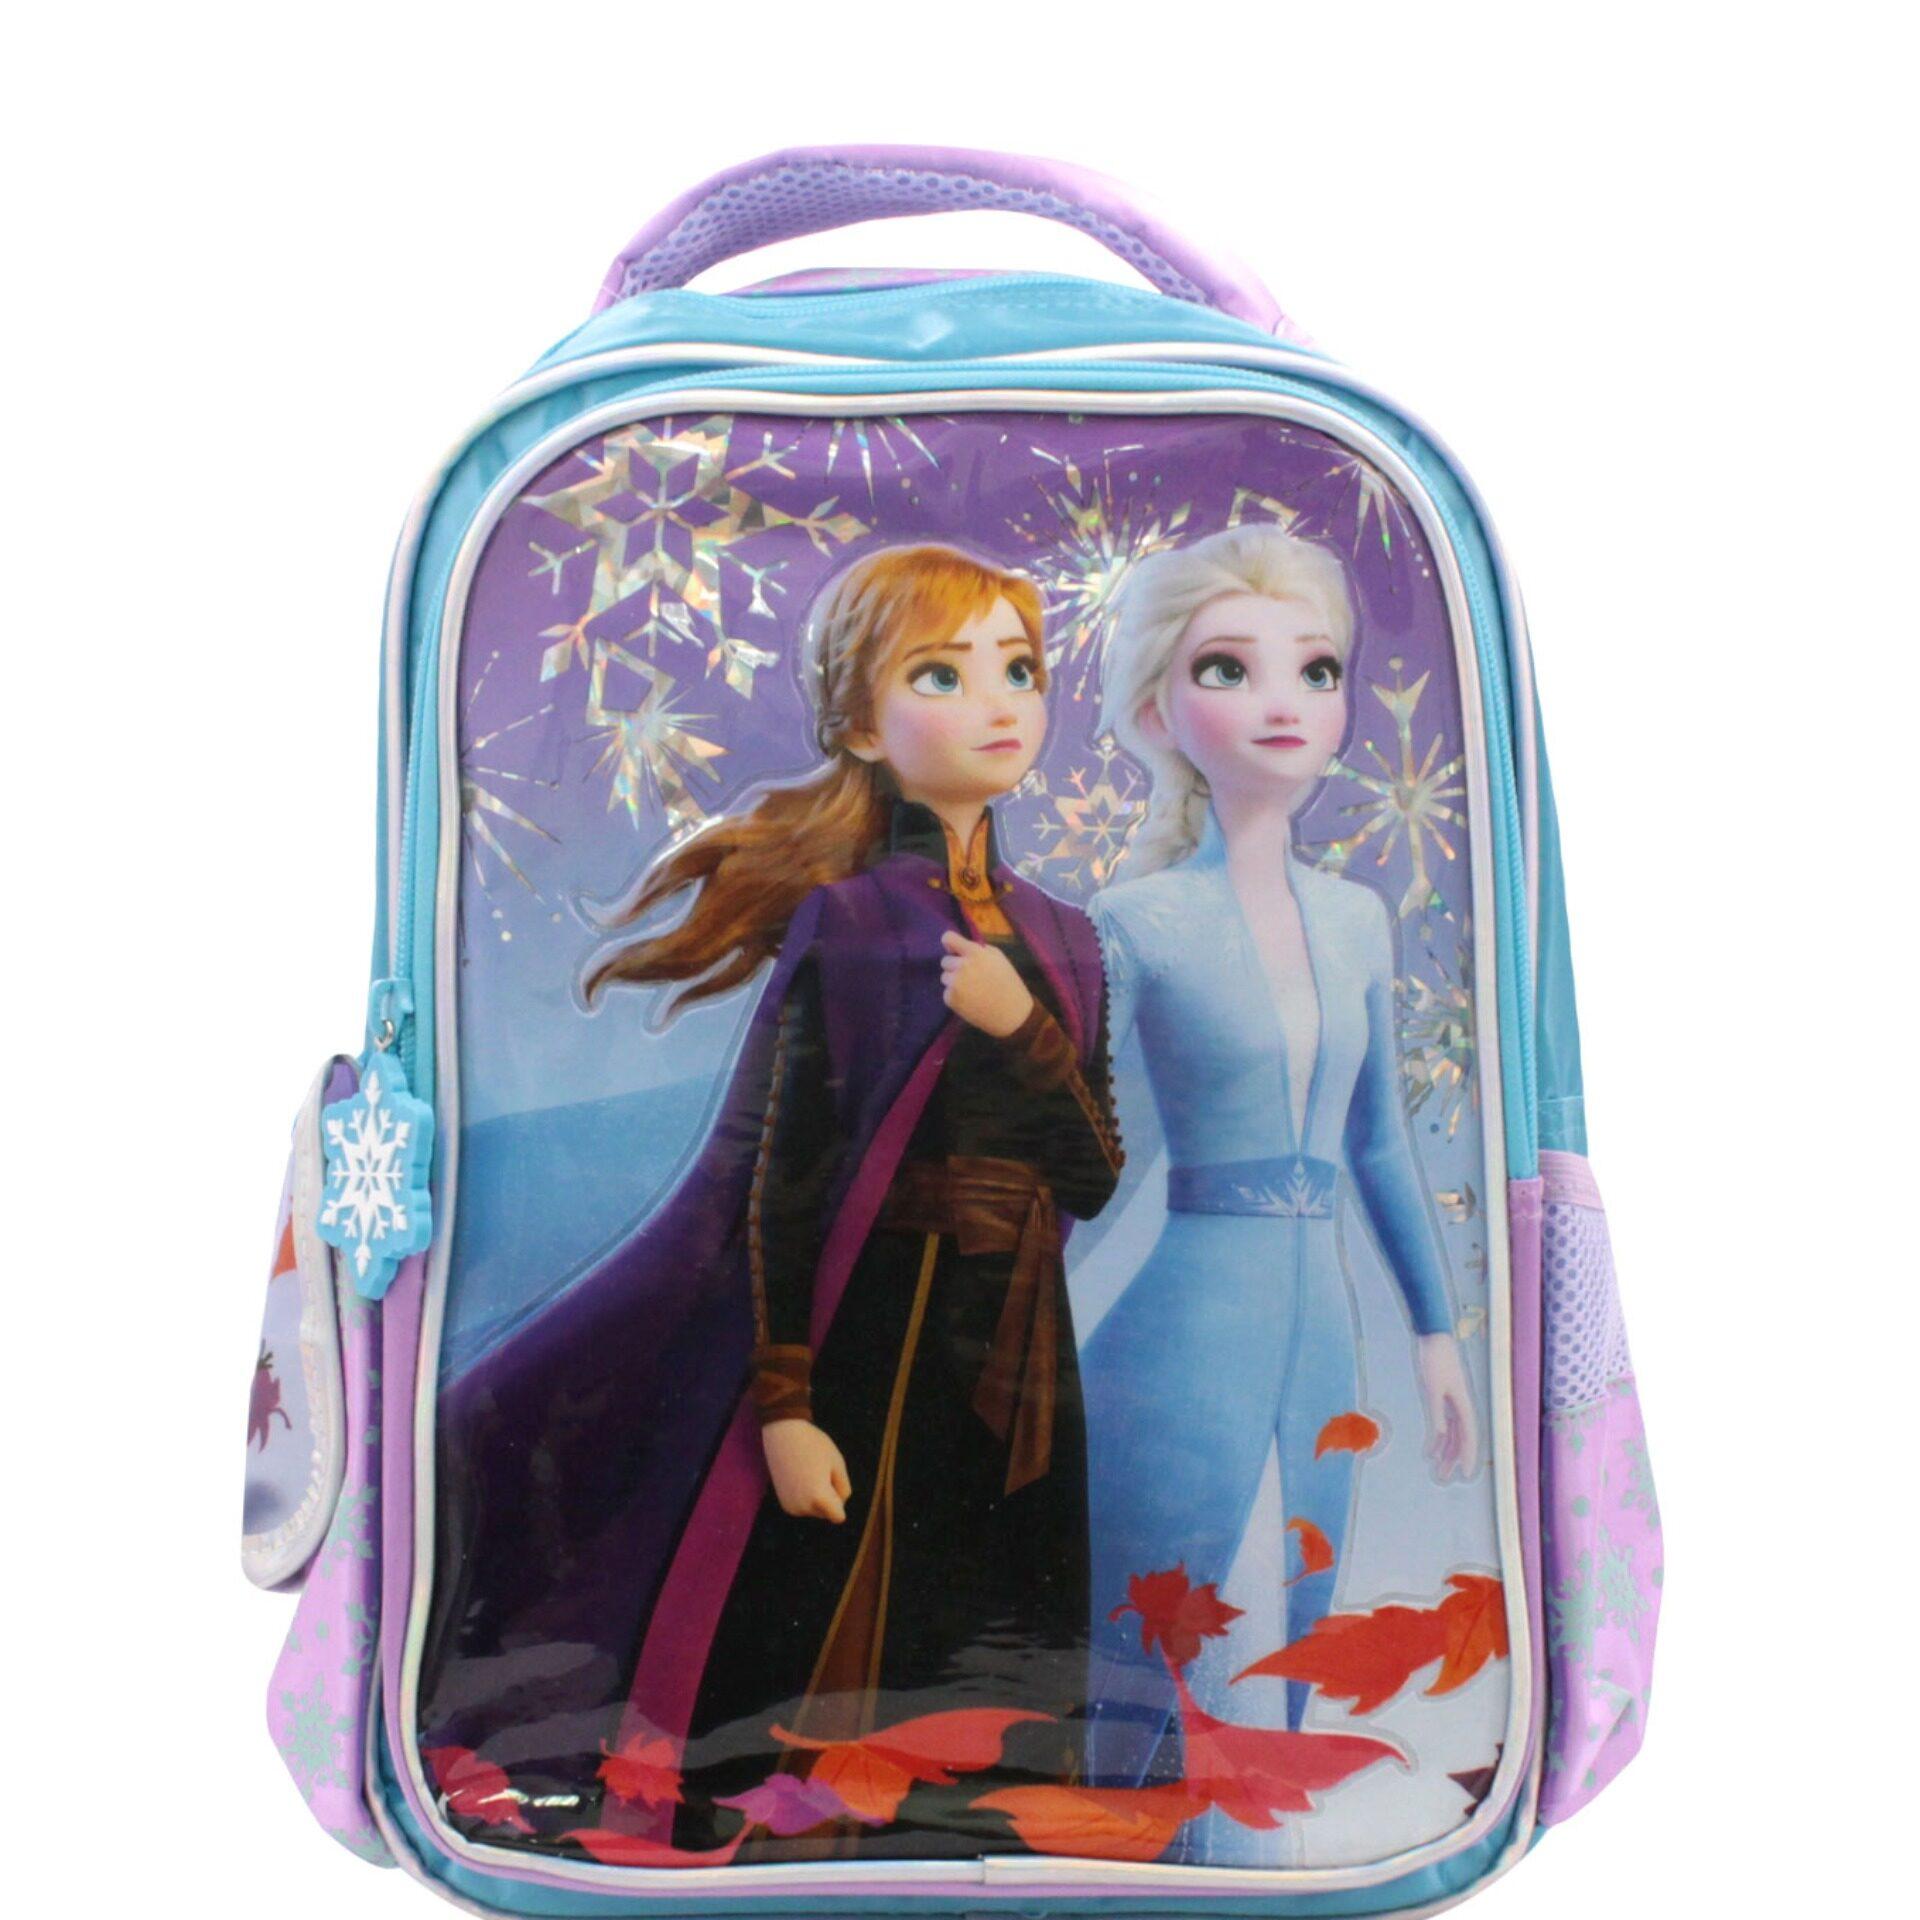 Disney Frozen 2 Princess Elsa, Anna & Olaf Pre School Bag (Light Purple & Blue) (Age 4 & Above)